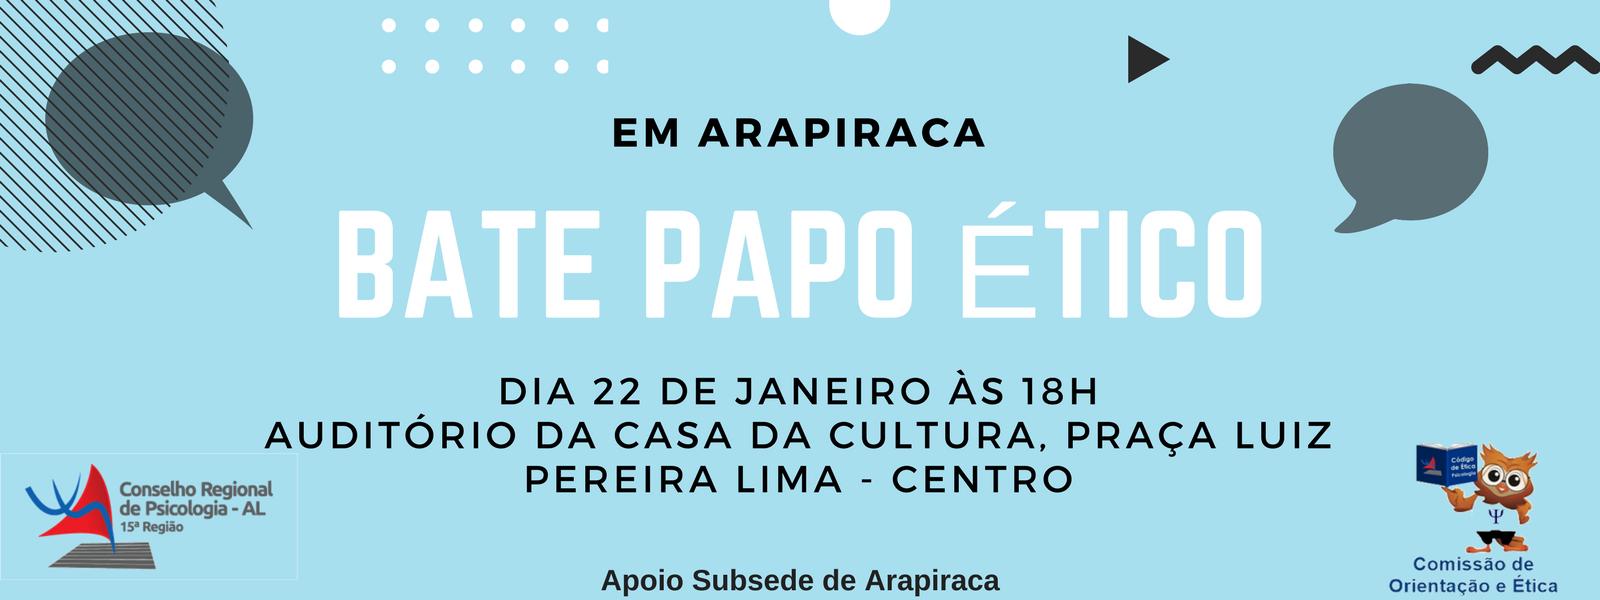 Bate Papo Ético em Arapiraca